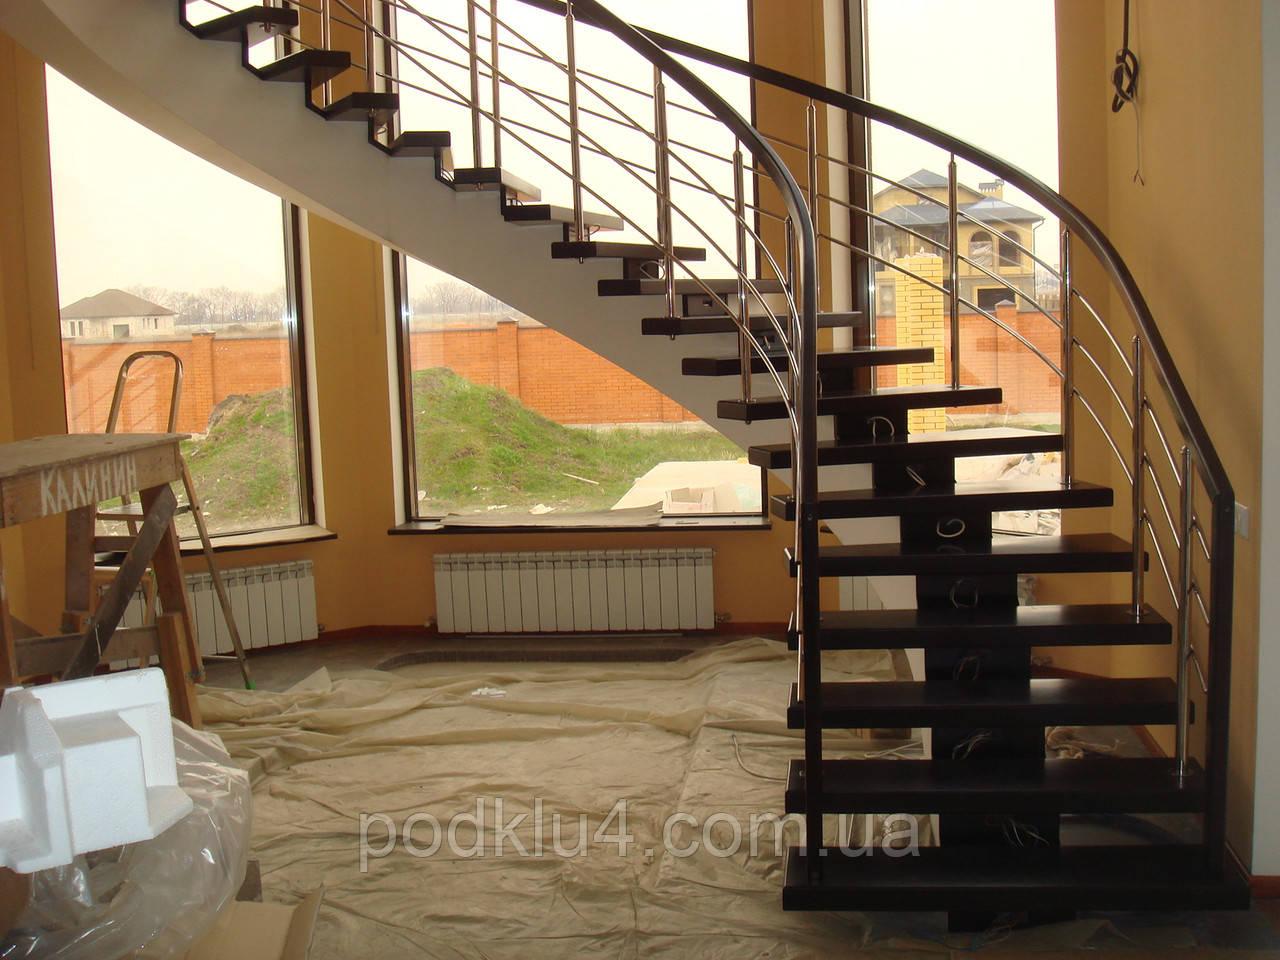 Лестницы на прямом косоуре